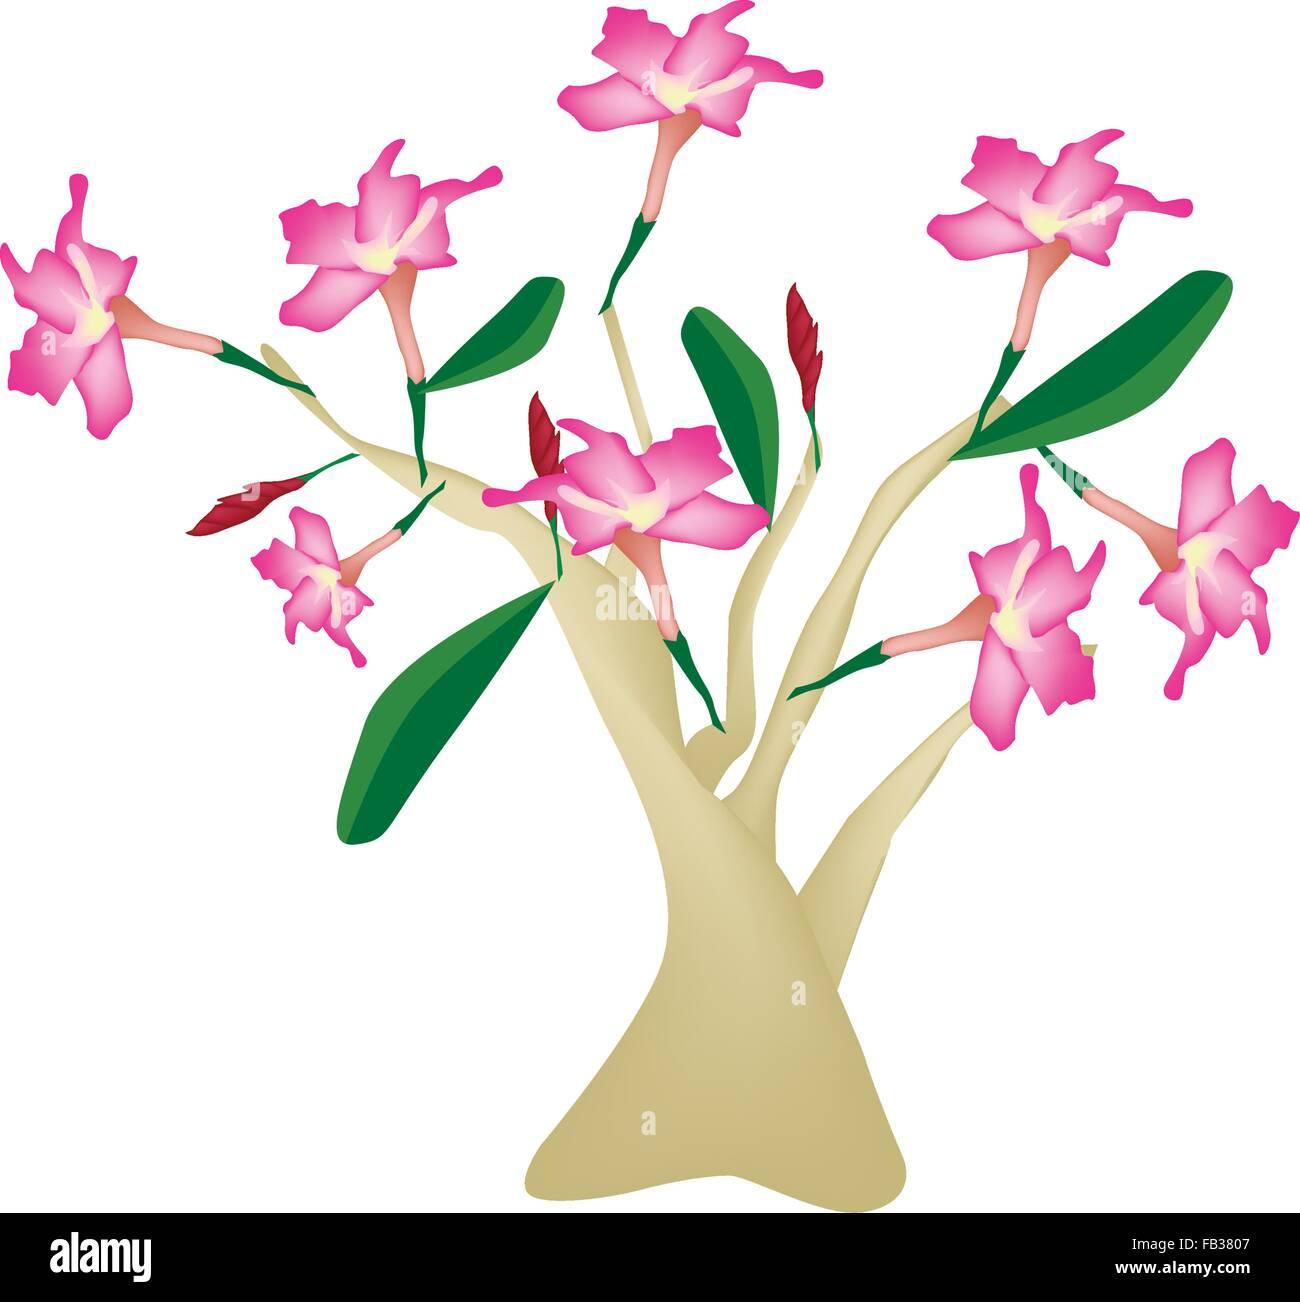 Beautiful flower illustration of pink desert rose or pink bignonia beautiful flower illustration of pink desert rose or pink bignonia isolated on white background izmirmasajfo